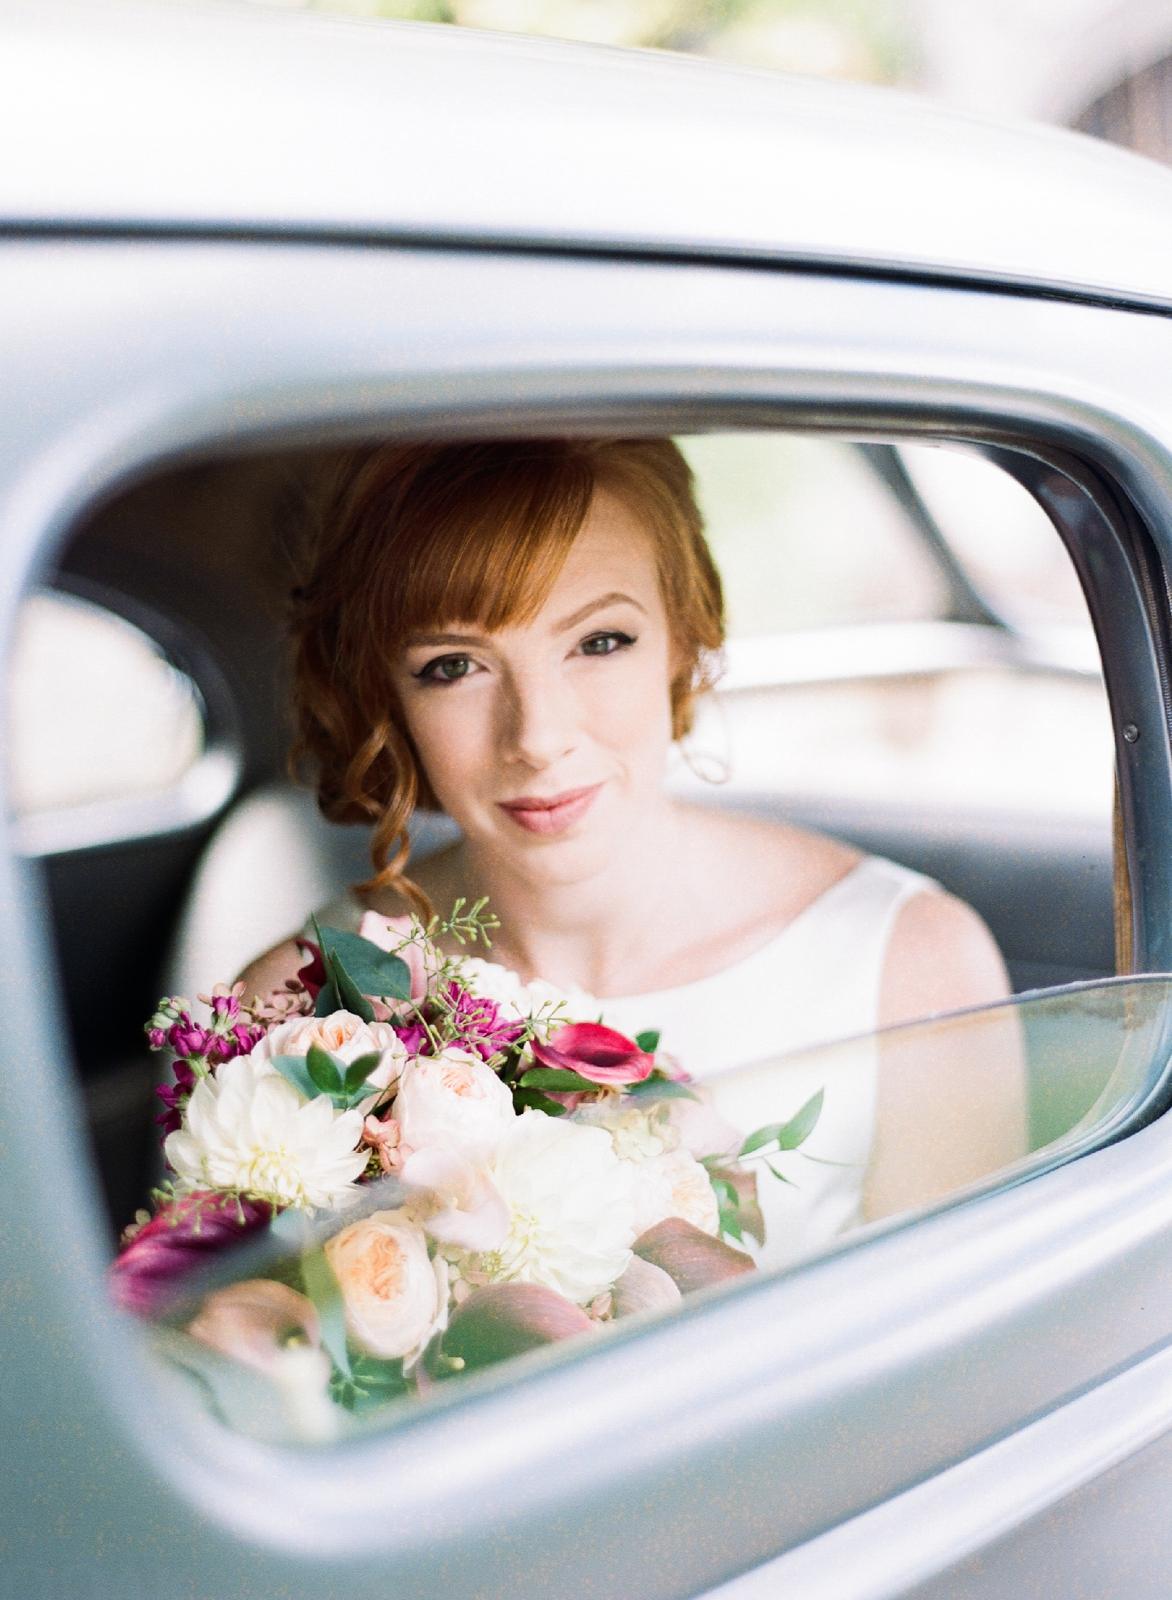 ringwood new jersey wedding photographer shannon griffin_0006.jpg